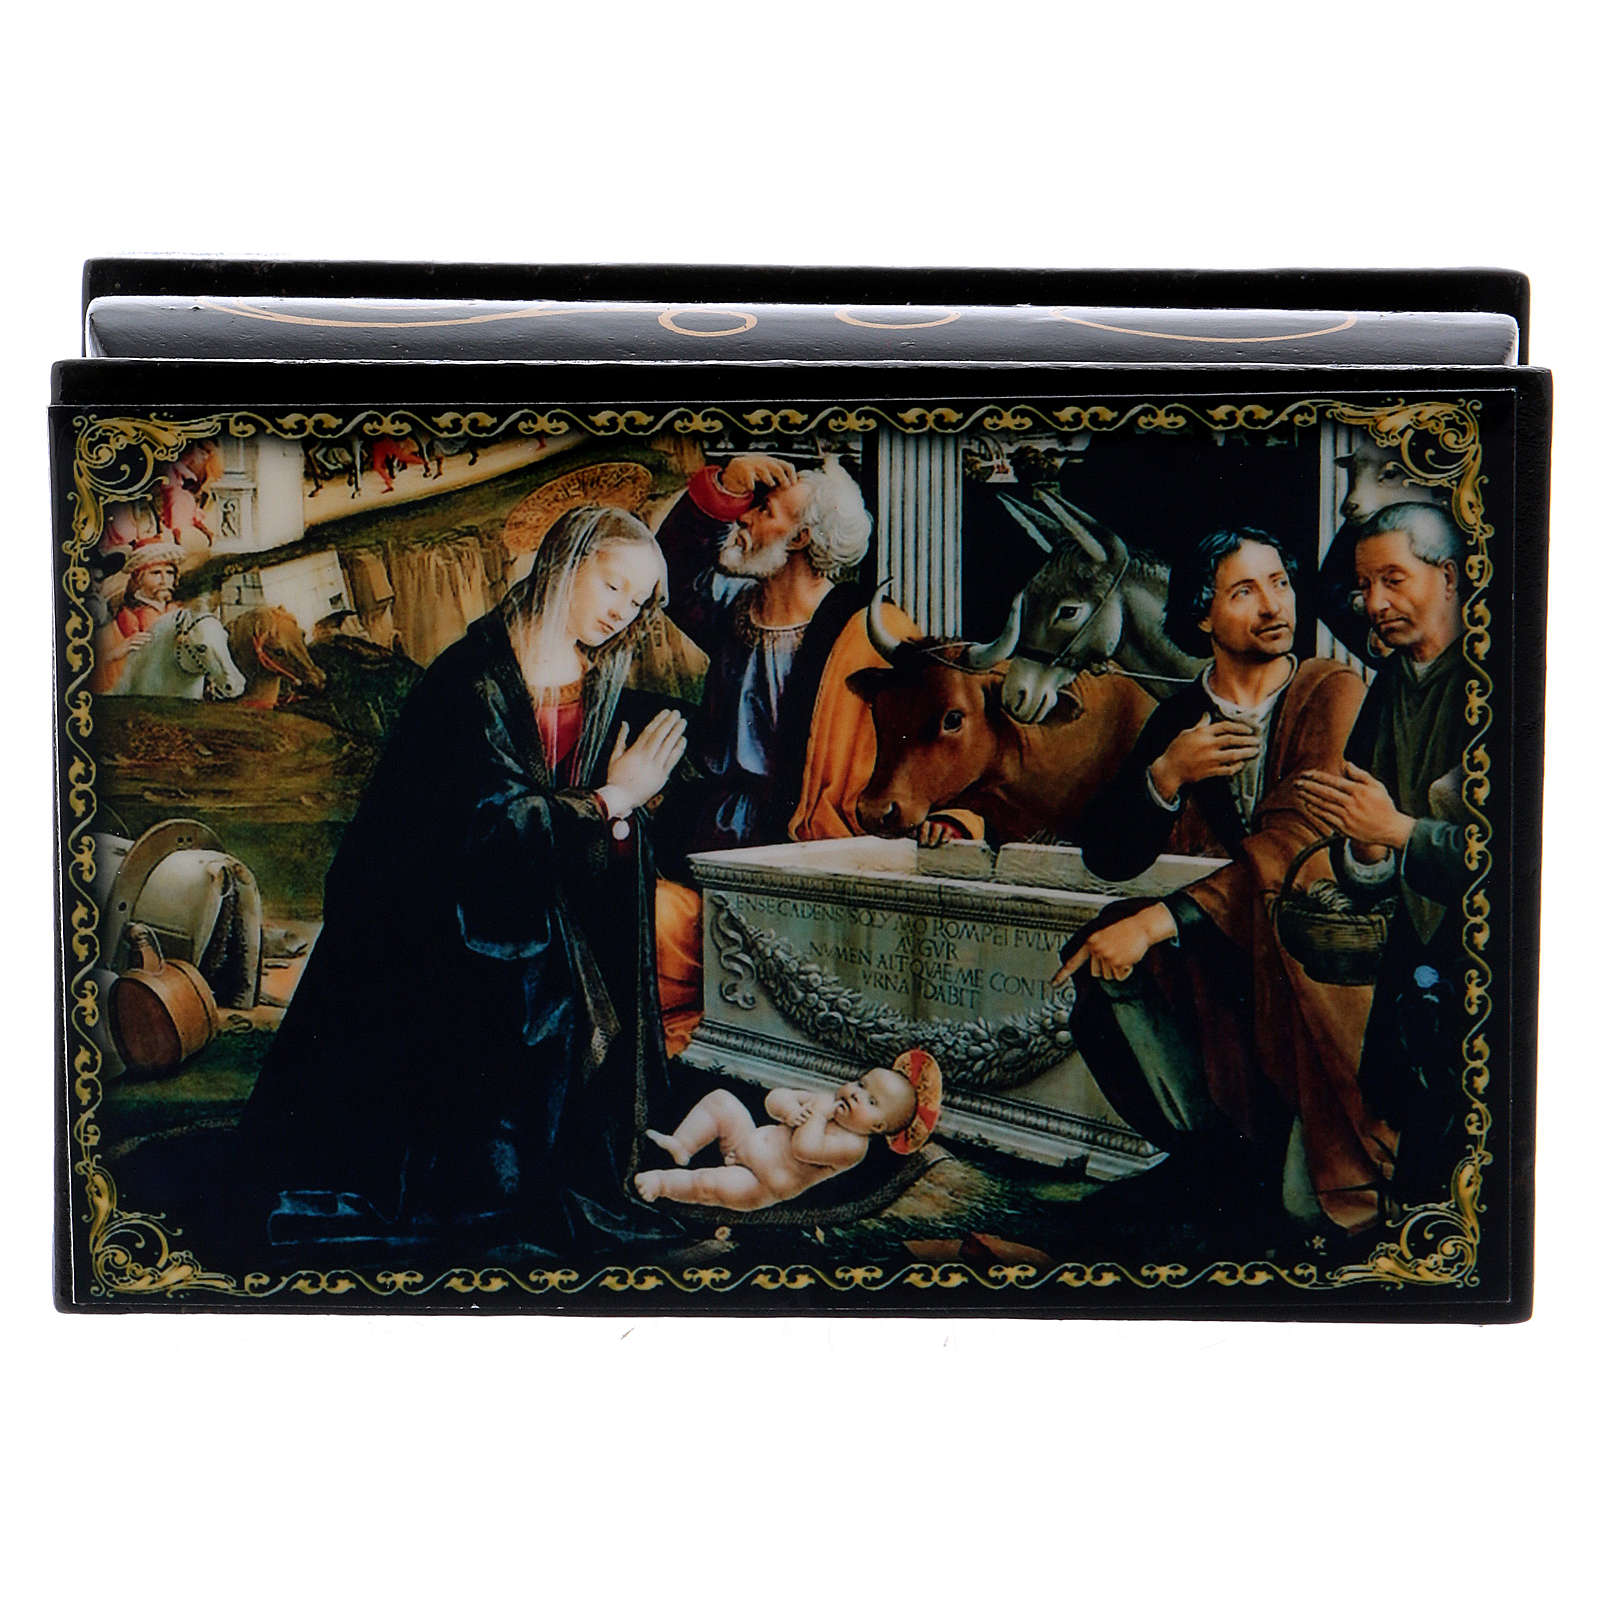 Russian papier-mâché and lacquer painted box Adoration of the Shepherds 9x6 cm 4